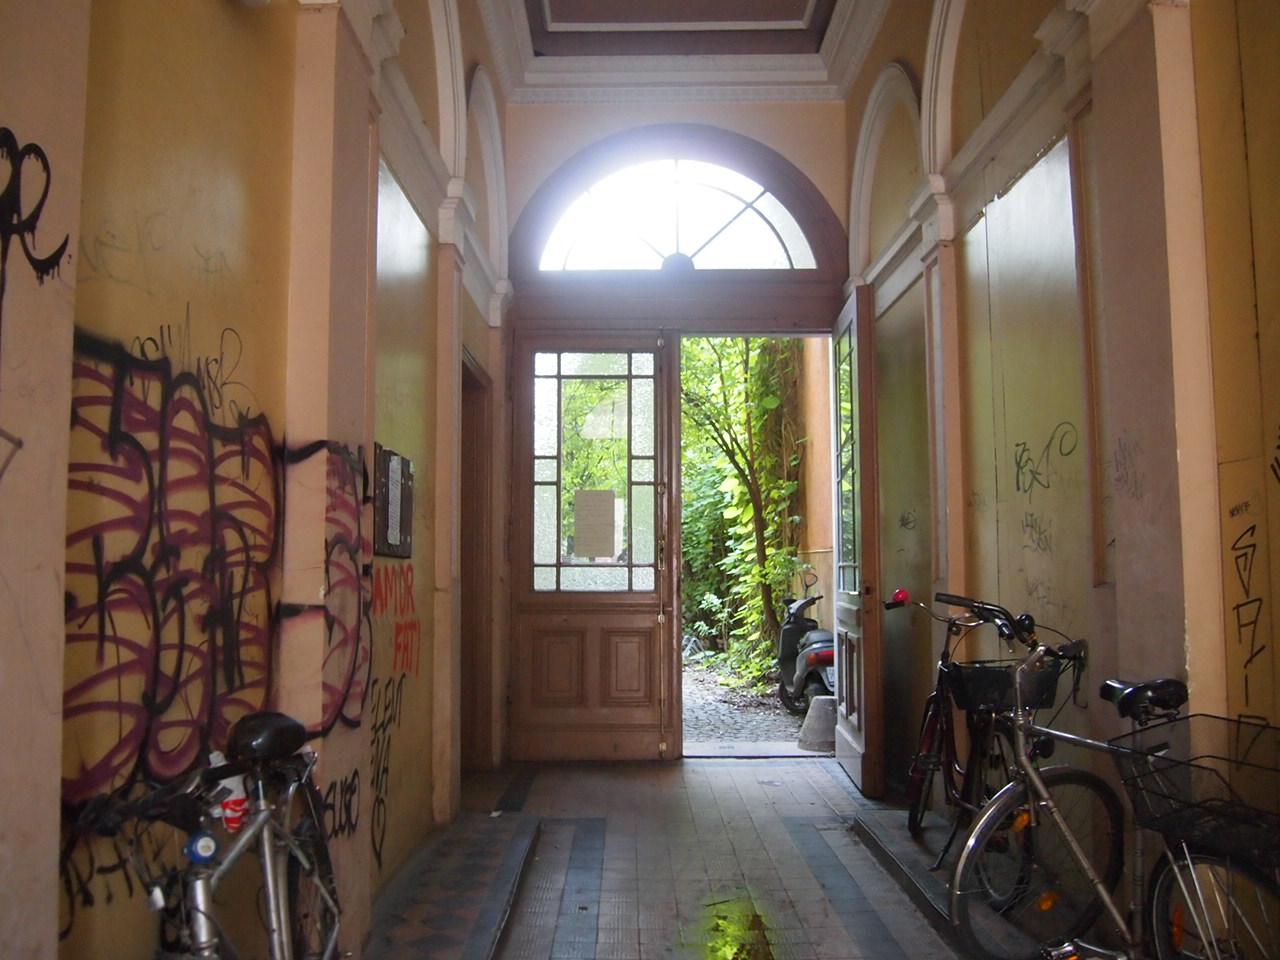 P6306181 アートと自然の多いベルリンの街並み